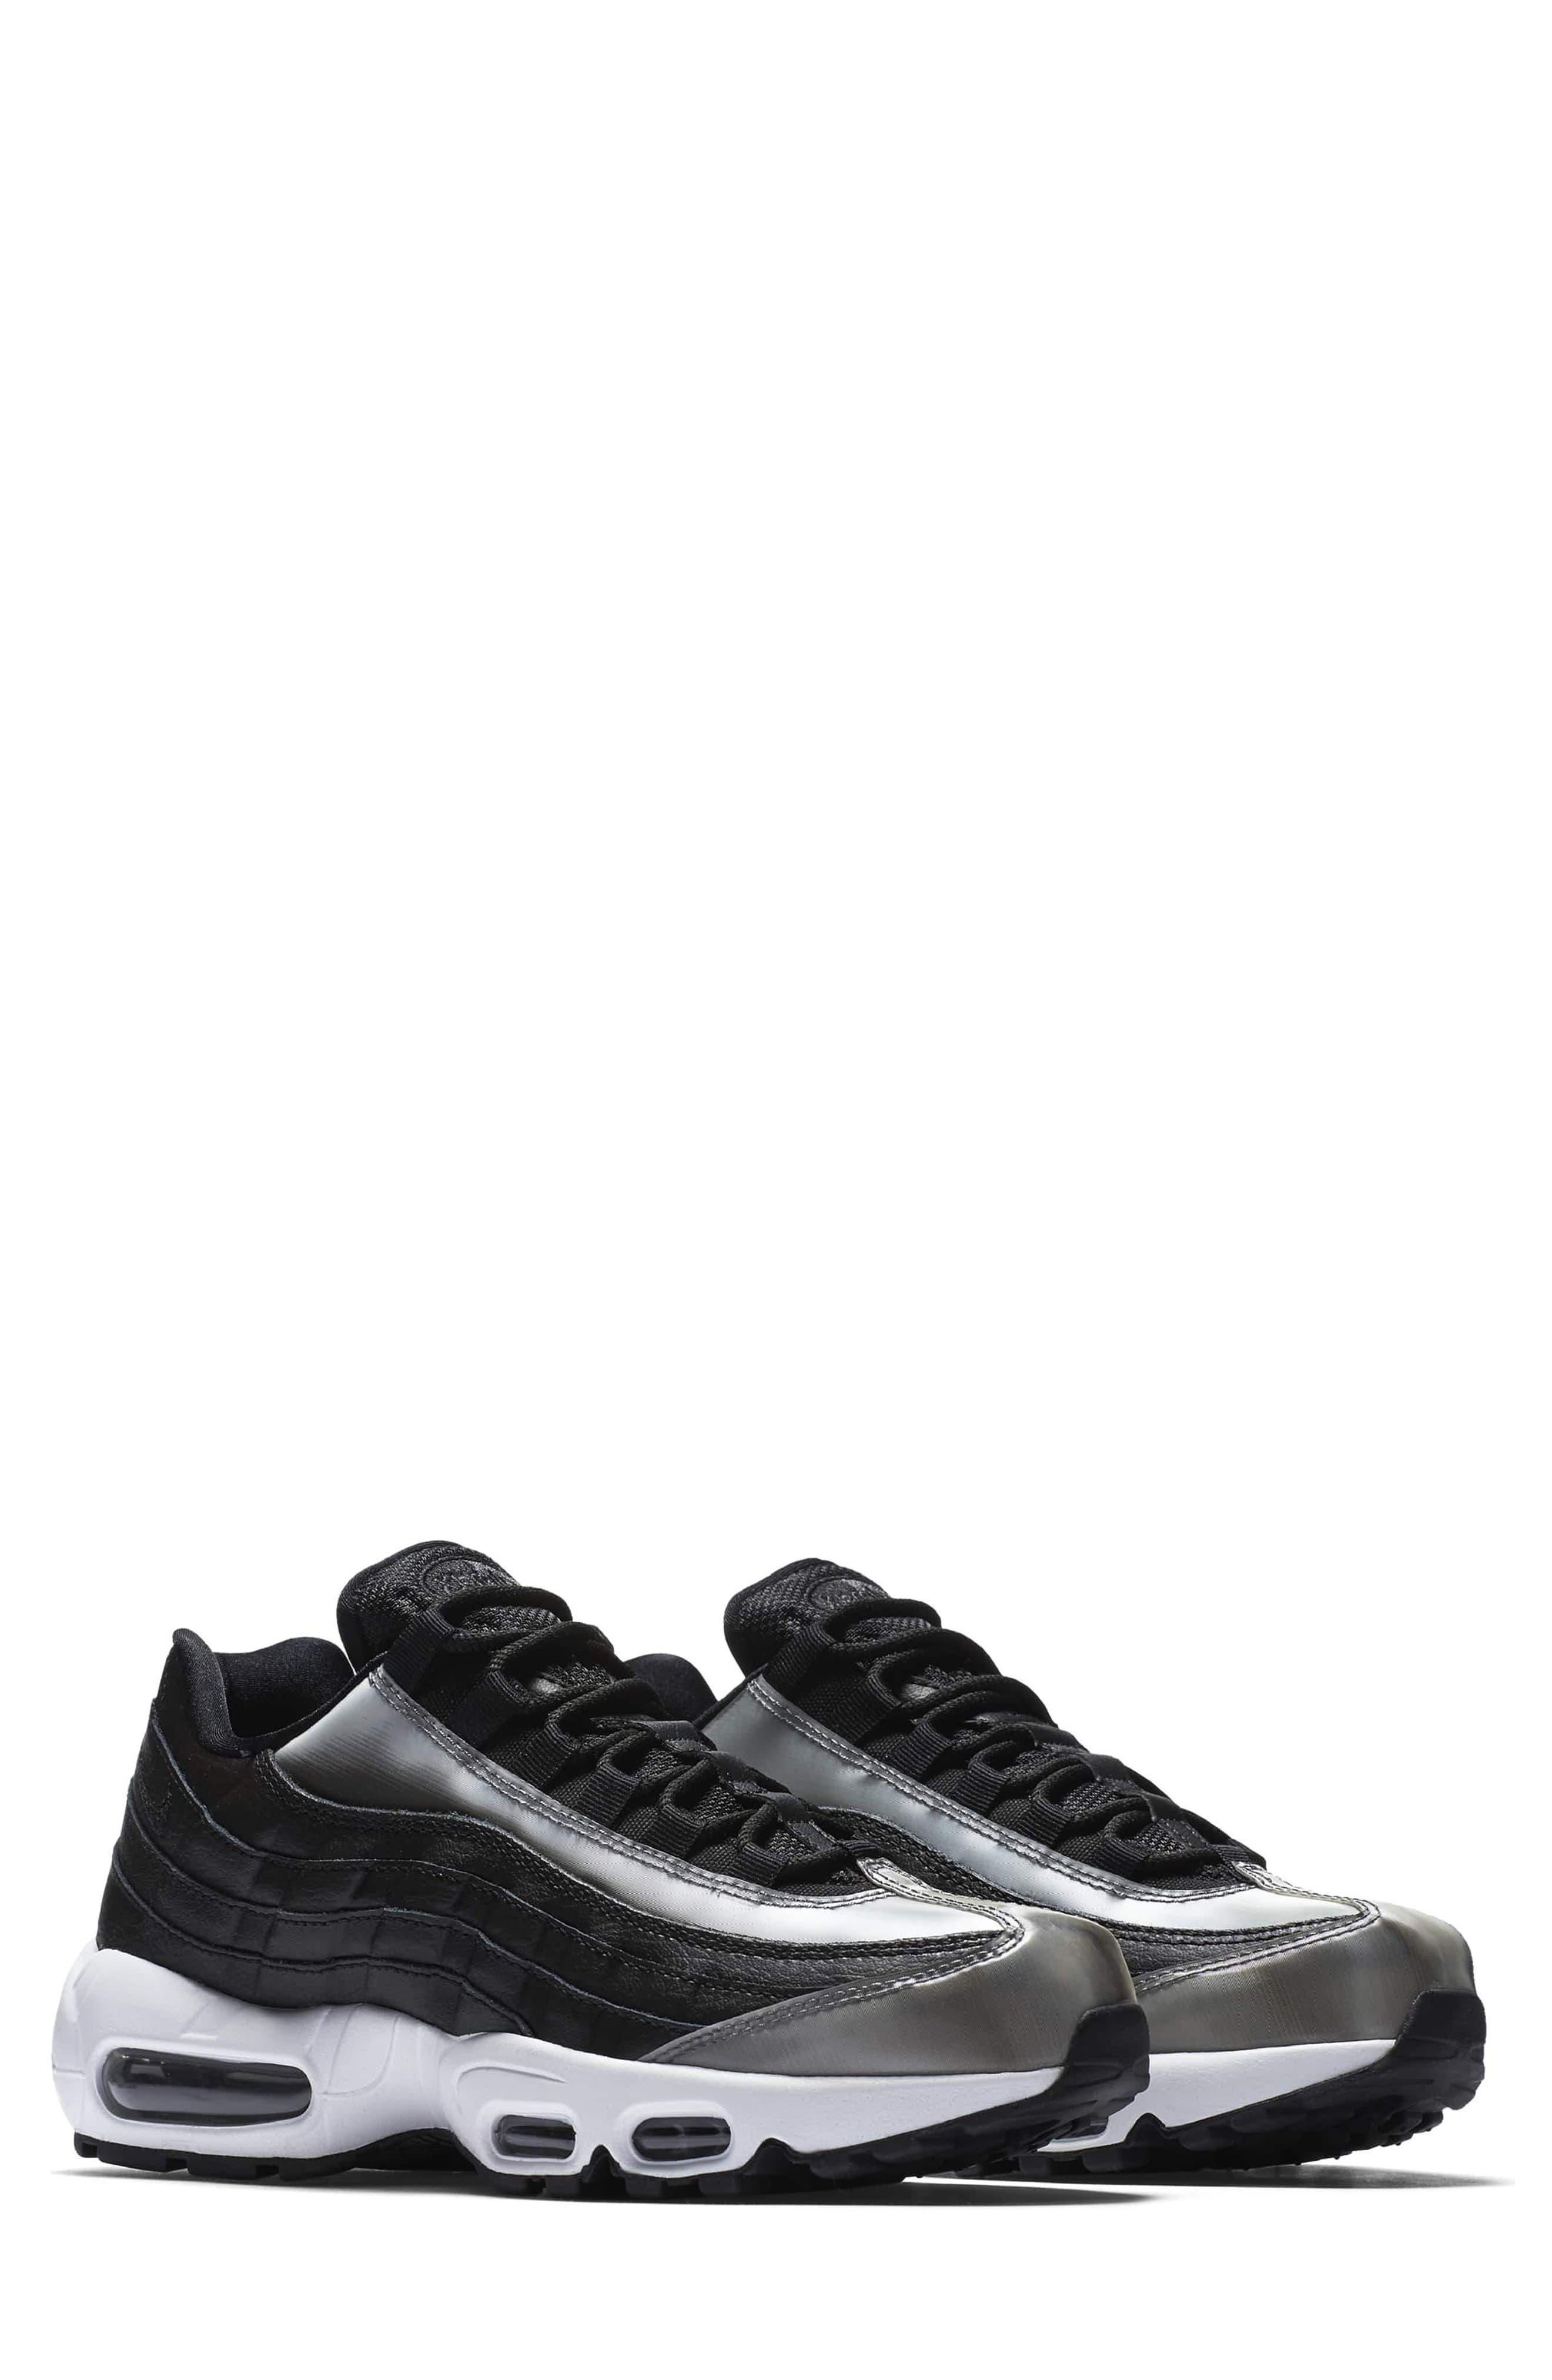 Alternate Image 1 Selected - Nike Air Max 95 SE Running Shoe (Women)